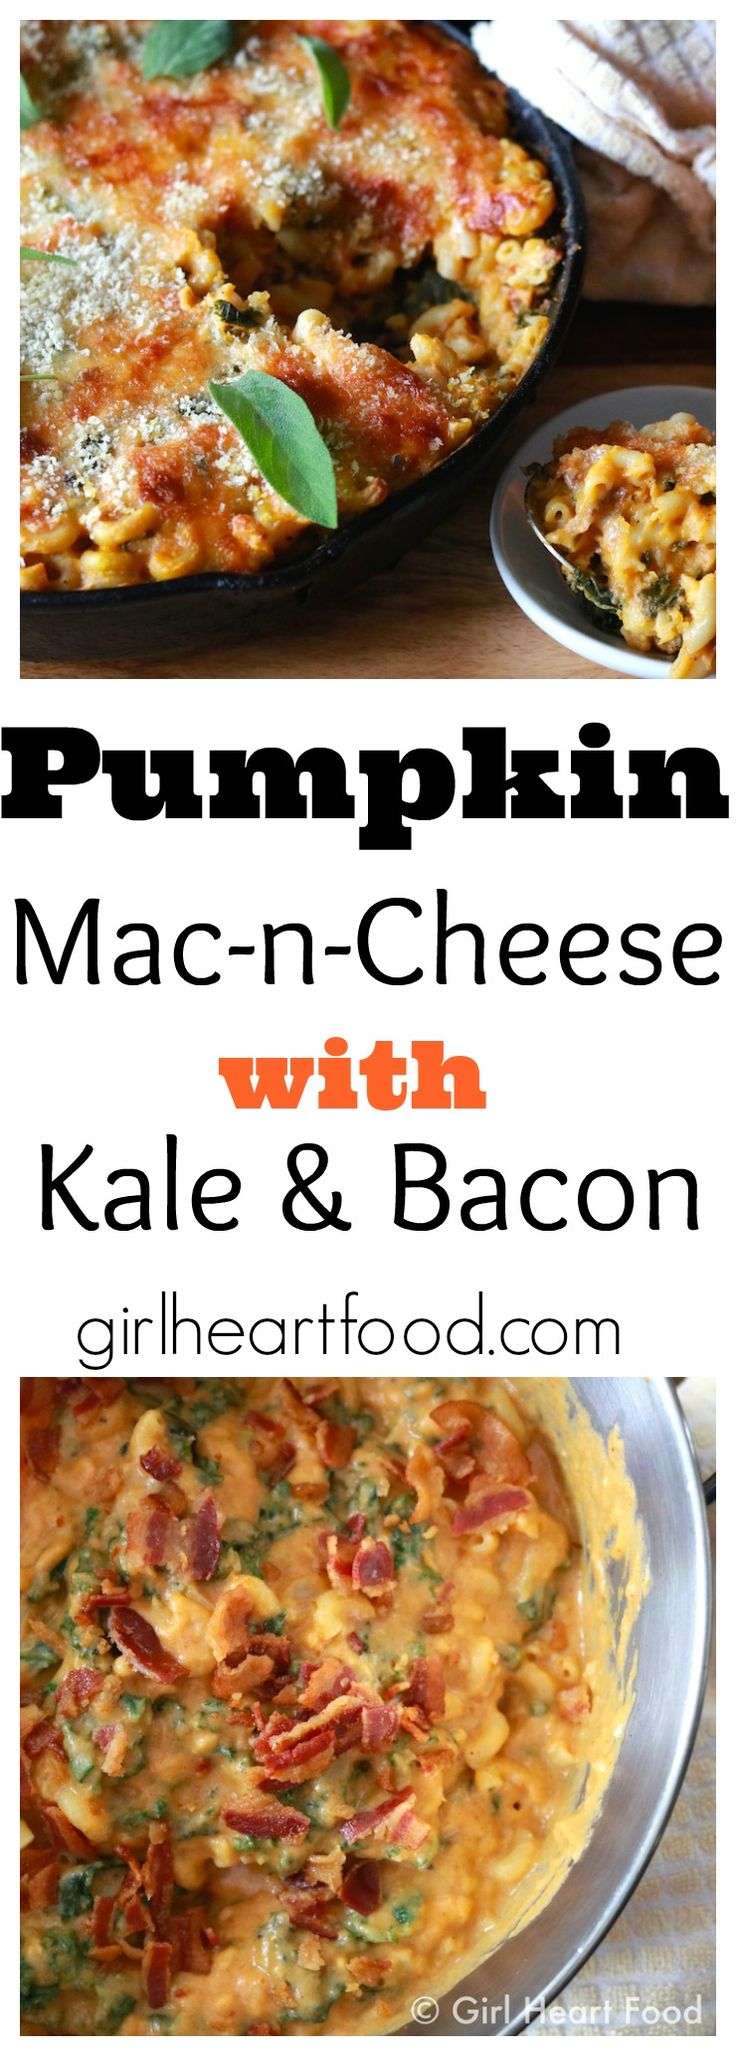 Pumpkin Mac-n-Cheese with Kale & Bacon - girlheartfood.com